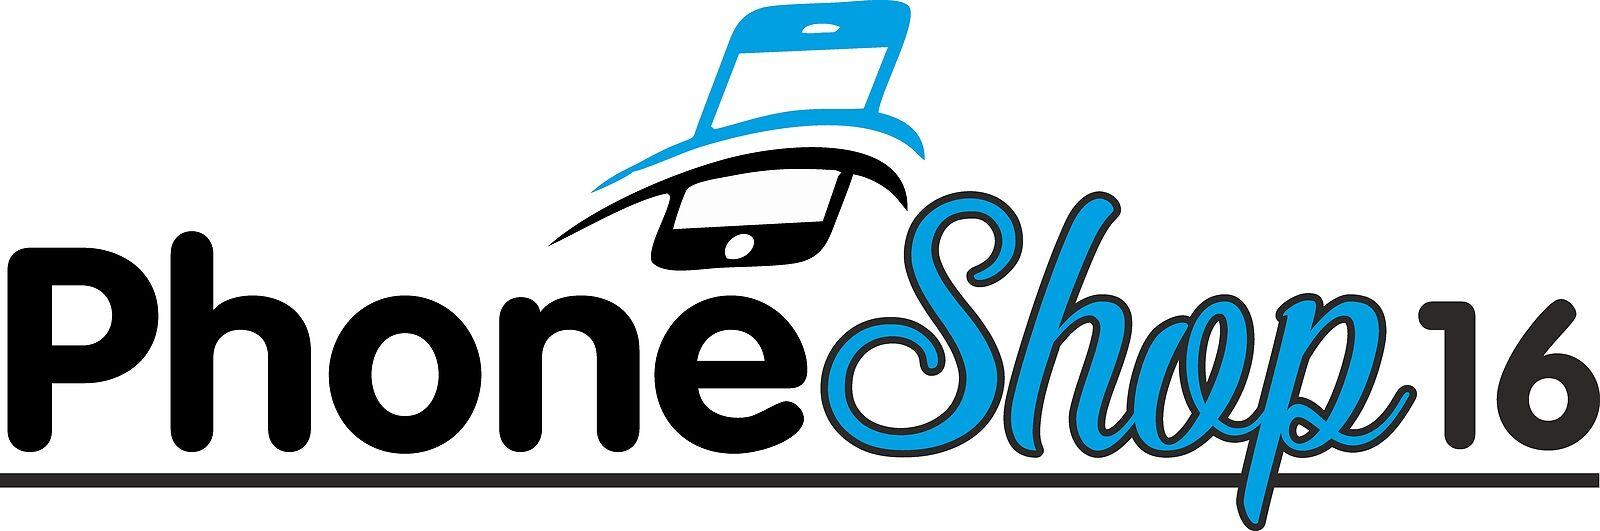 PhoneShop16